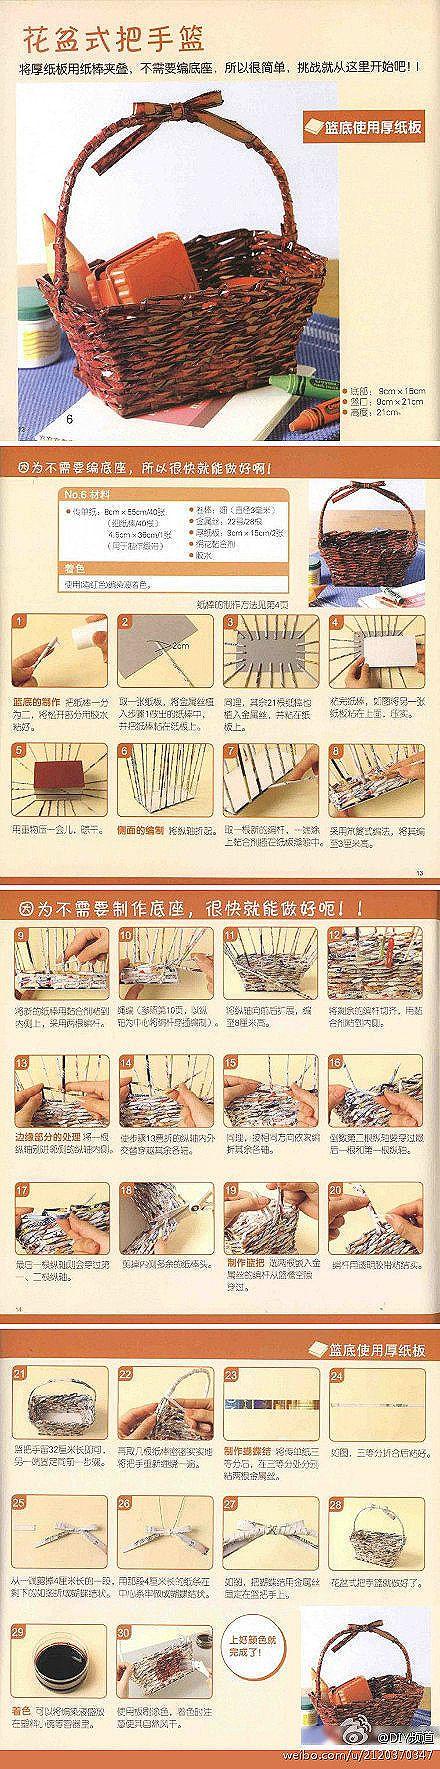 Handmade Baskets Tutorial : Handmade the old magazine diy baskets tutorial